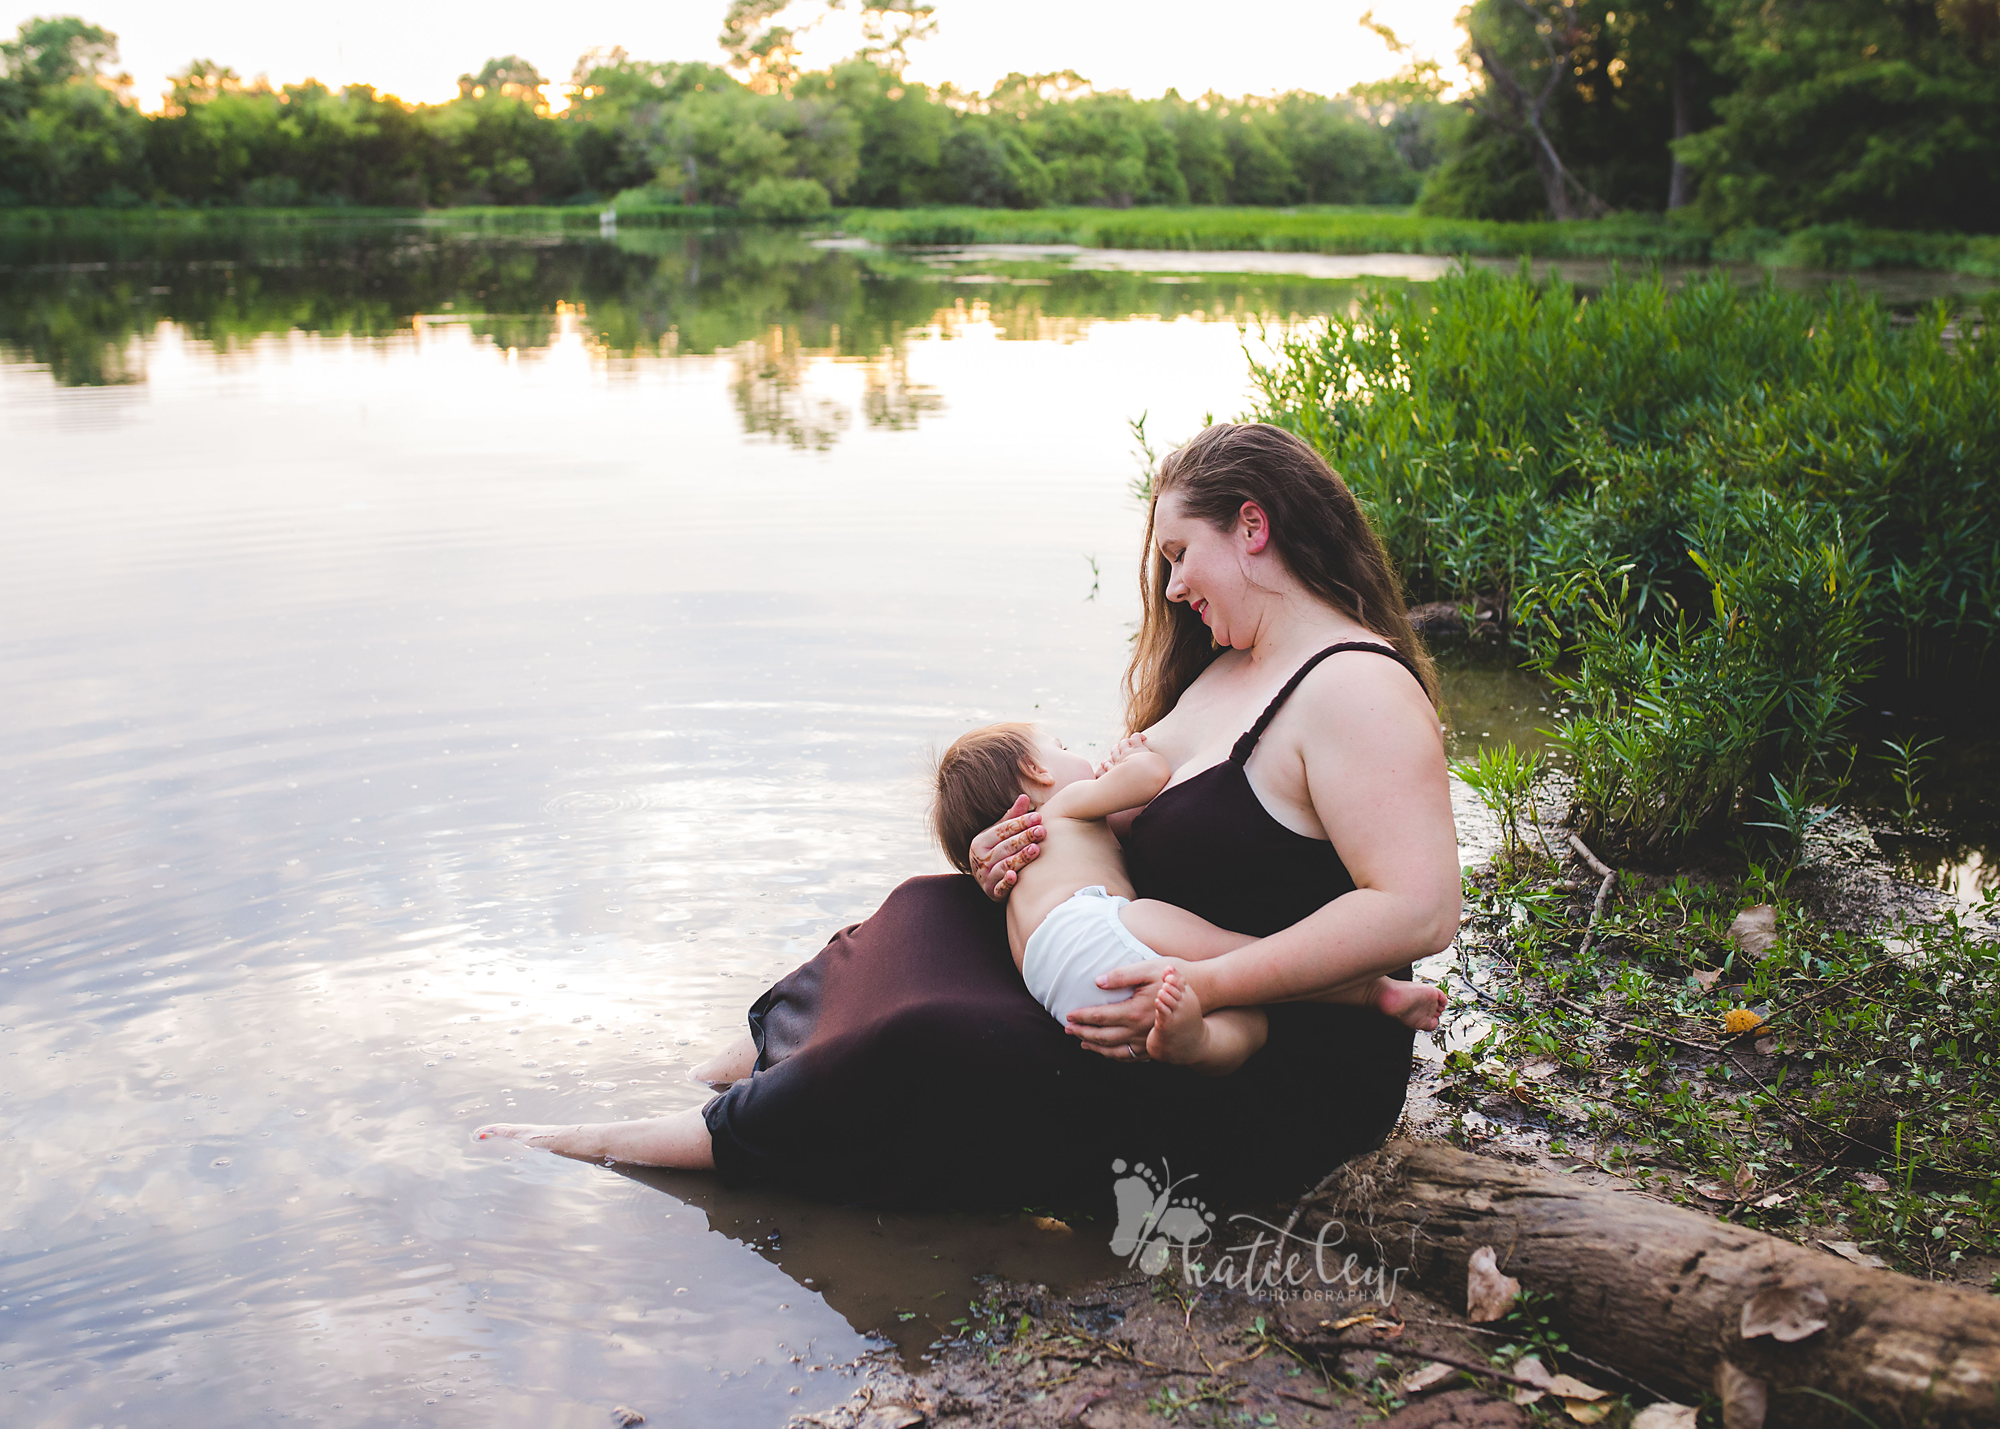 woman in a brown dress breastfeeding her son in water